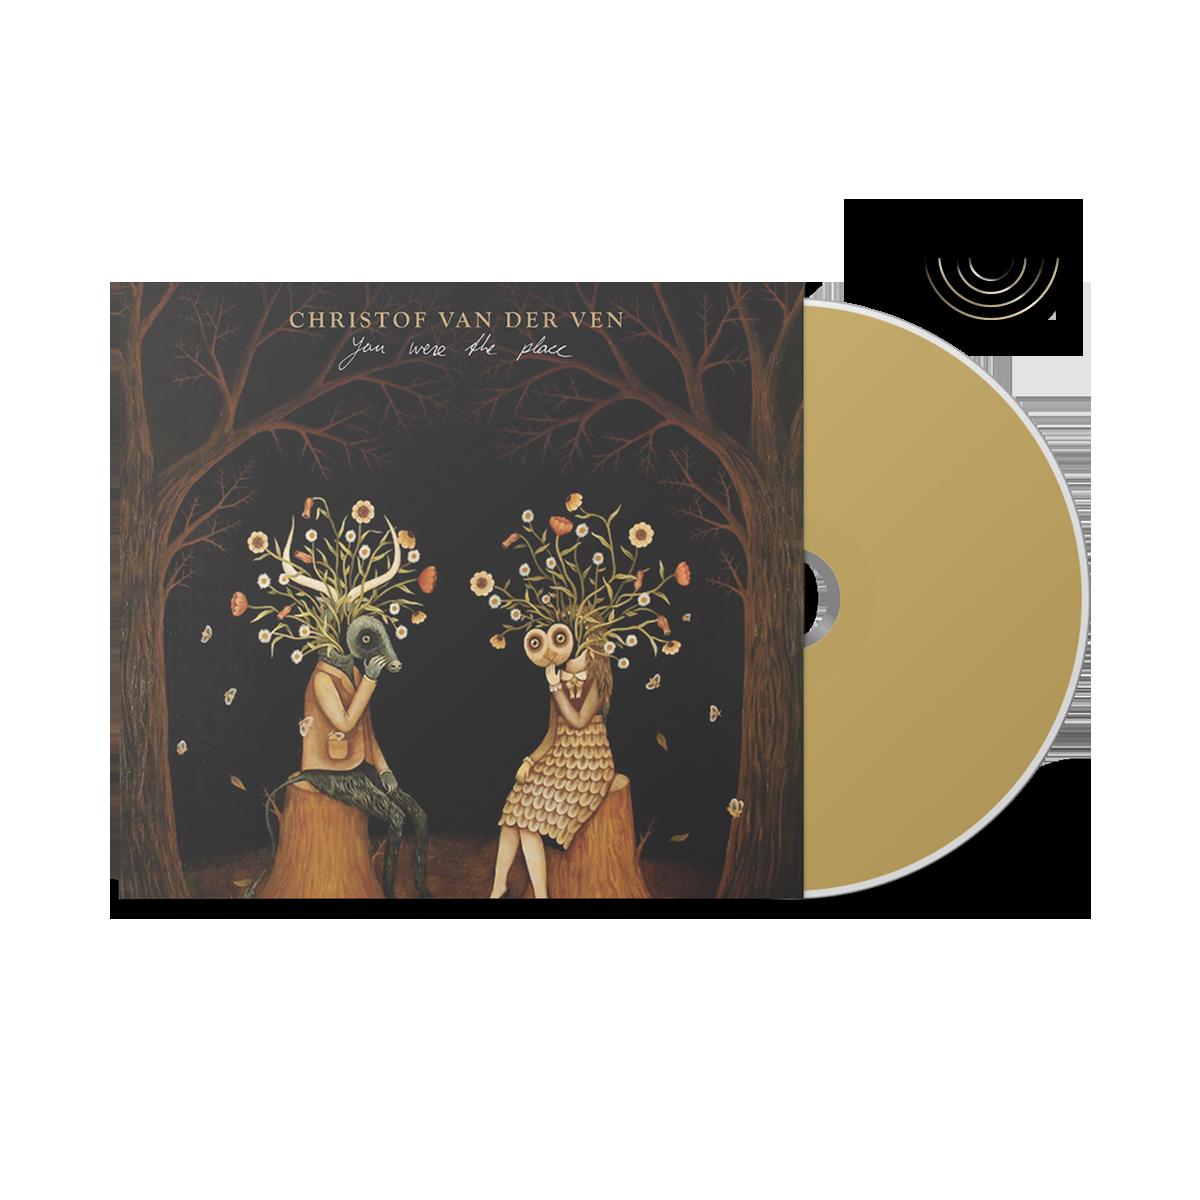 You Were The Place [SIGNED CD] - CHRISTOF VAN DER VEN